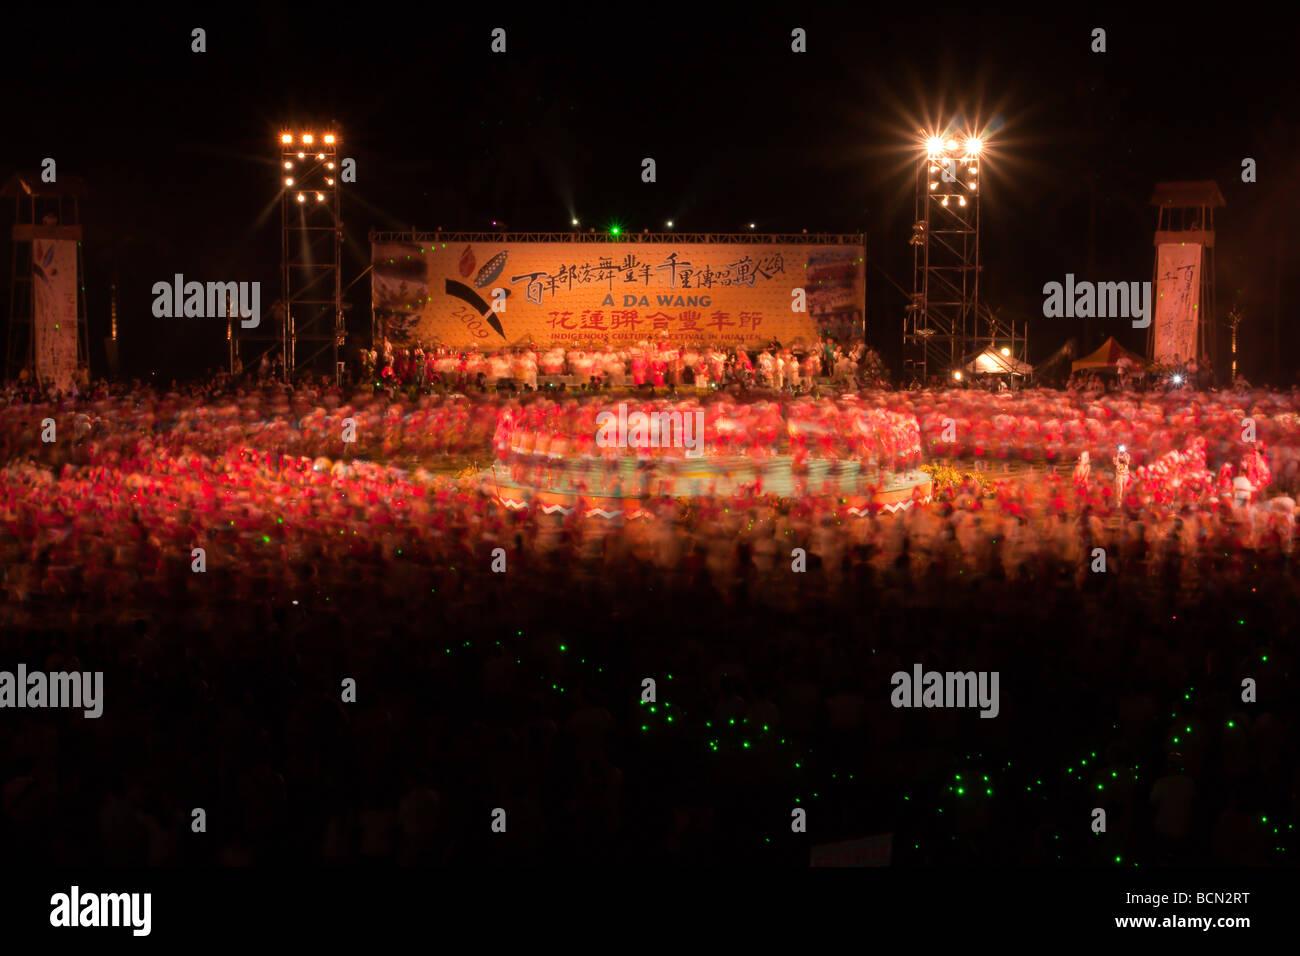 "2009 ""Un DA WANG' Culture Indigene Festival (Aboriginal Harvest Festival) a Hualien City, Hualien County, Immagini Stock"